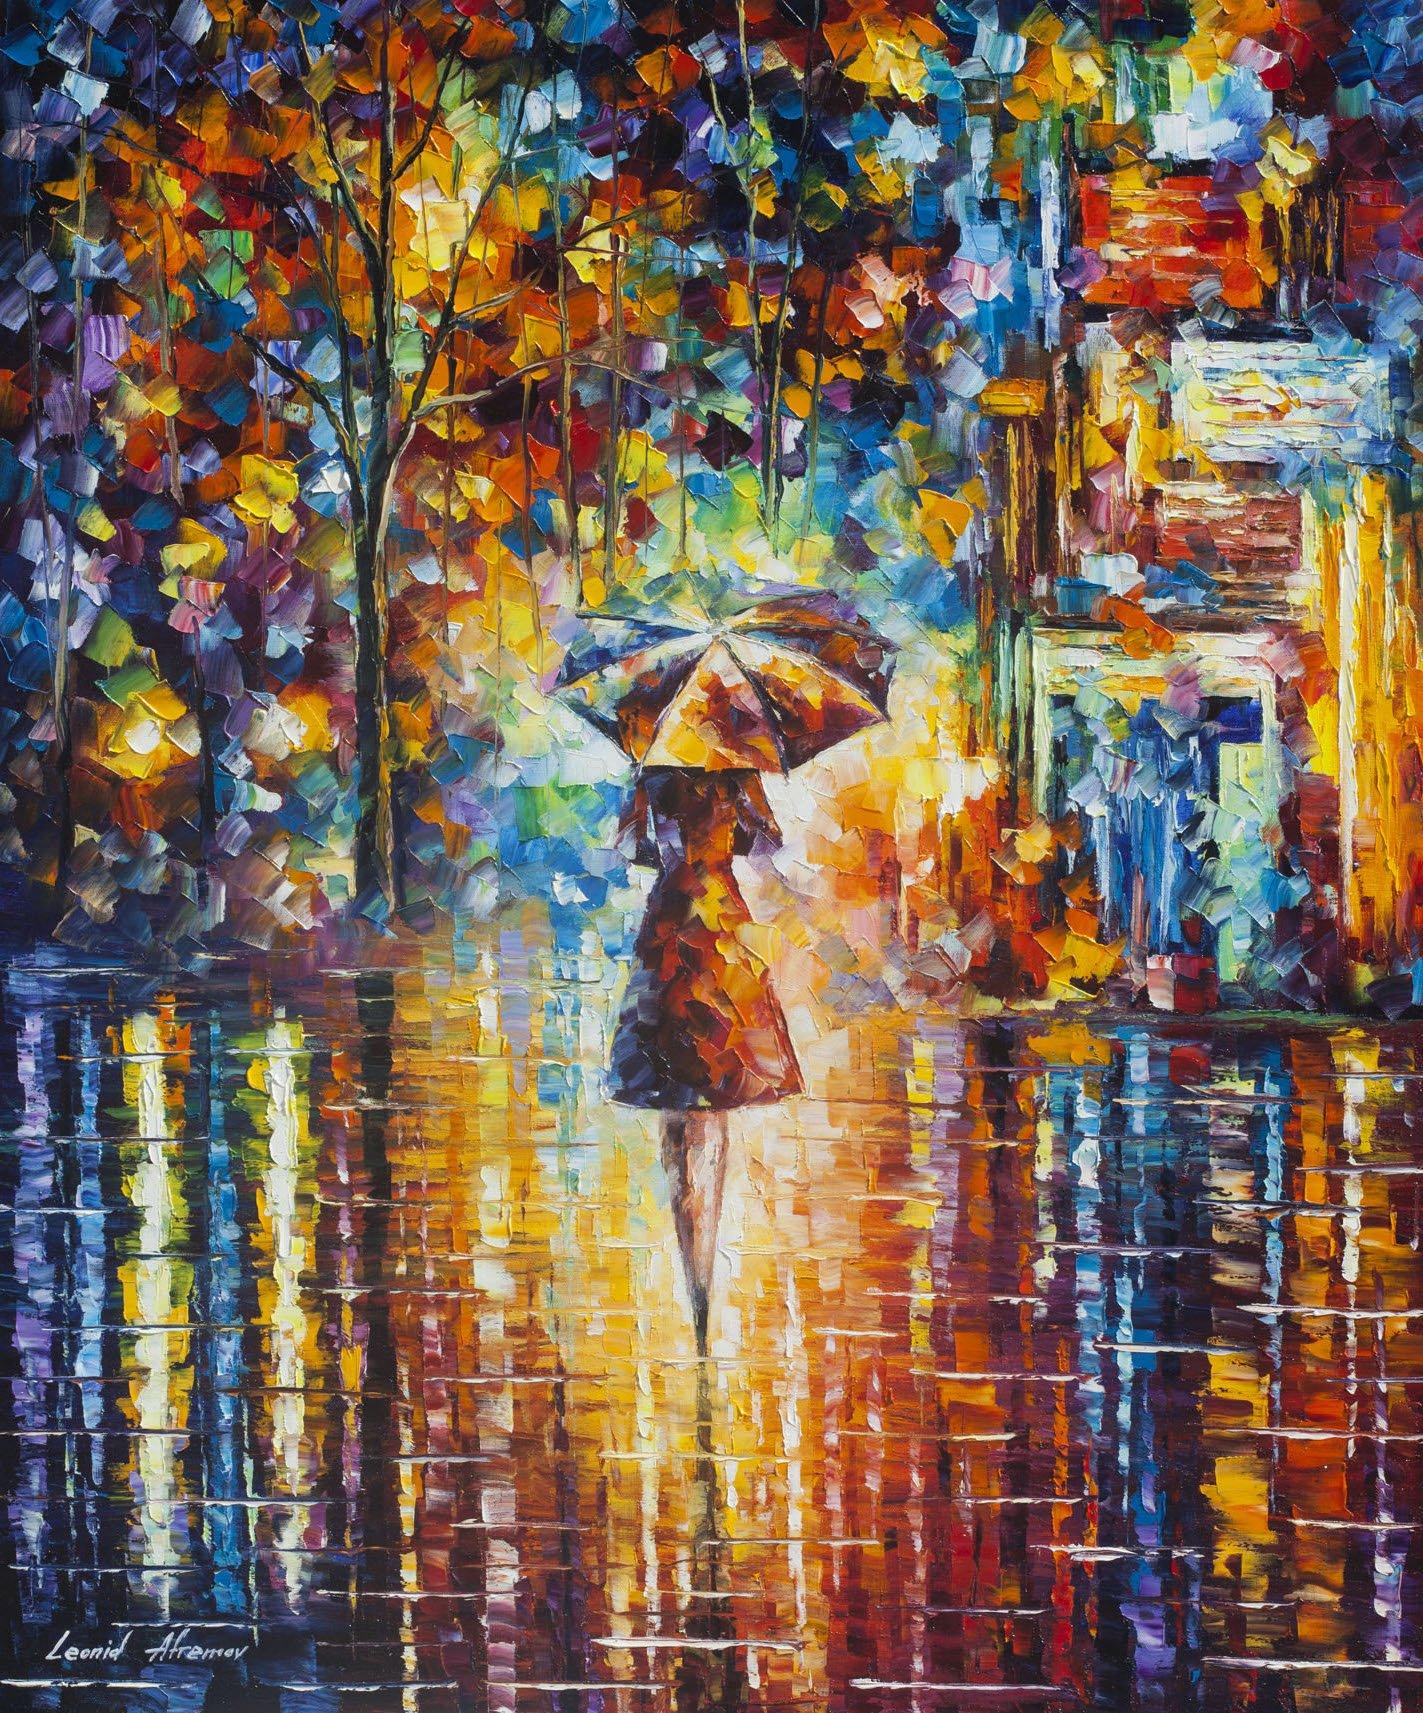 RAIN PRINCESS 3 (40 x 30) - Artist Proof by Leonid Afremov by